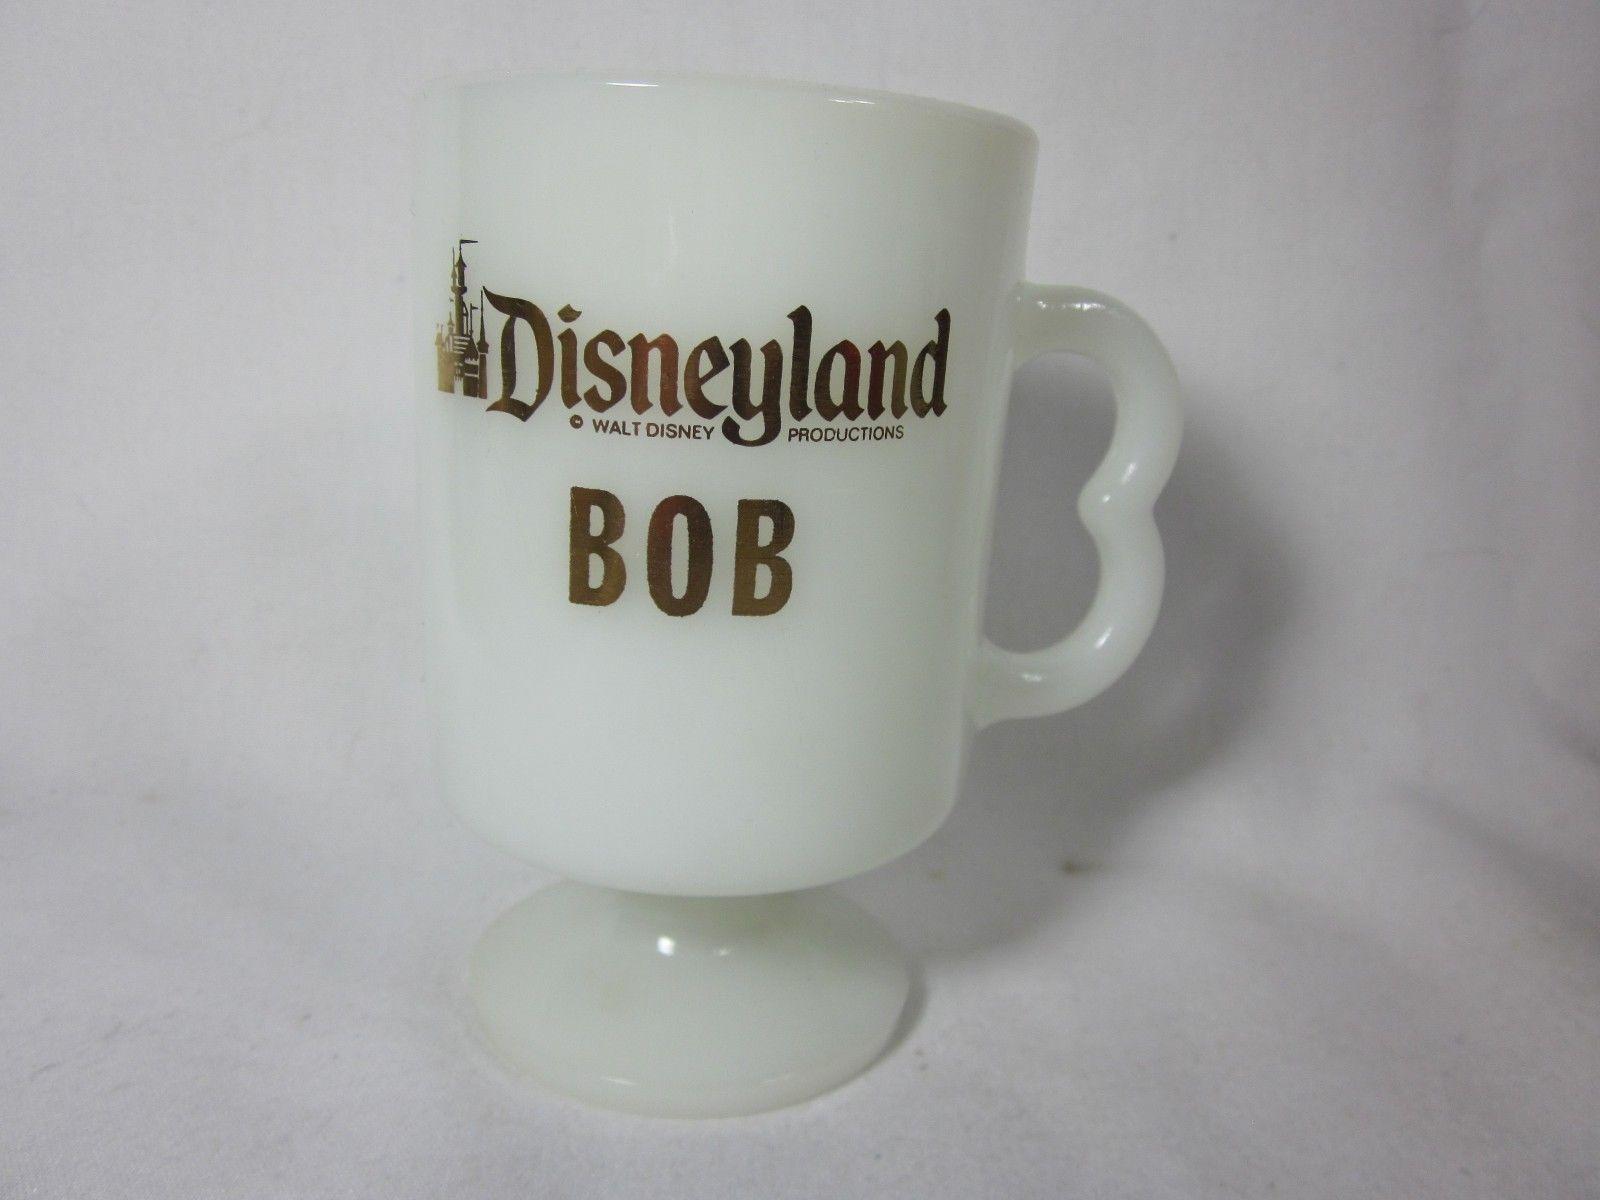 Vintage Disneyland Walt Disney Retired Cup BOB